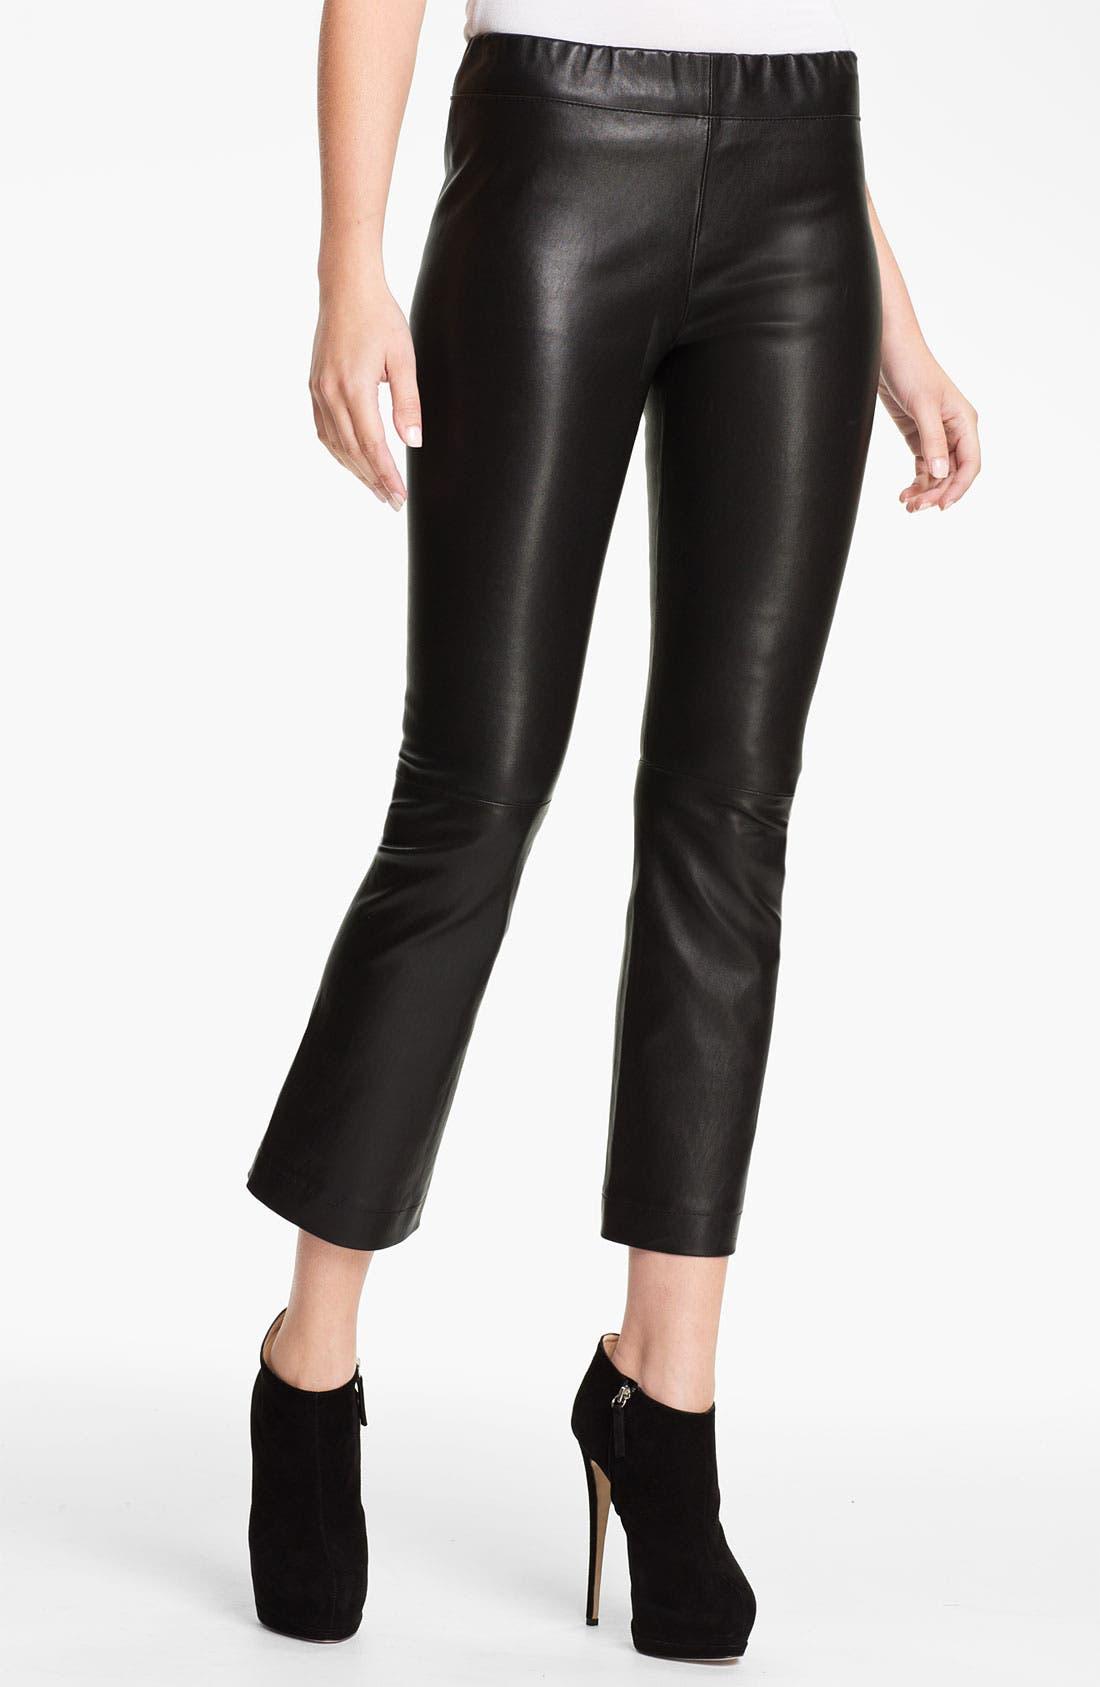 Main Image - Elizabeth and James 'Allen' Crop Bootcut Leather Pants